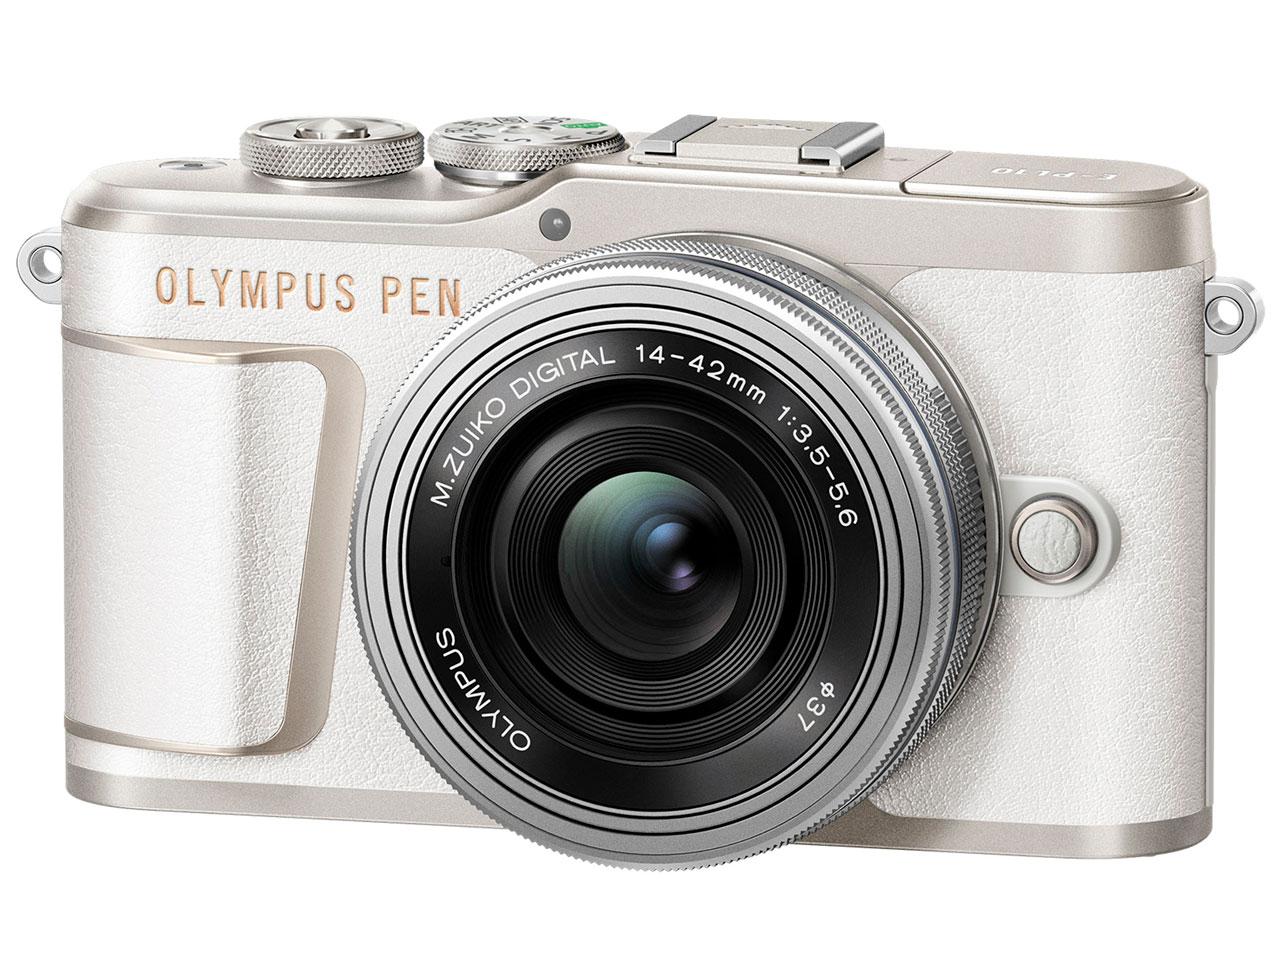 OLYMPUS PEN E-PL10 EZダブルズームキット [ホワイト]【お取り寄せ商品(3週間~4週間程度での入荷、発送)】